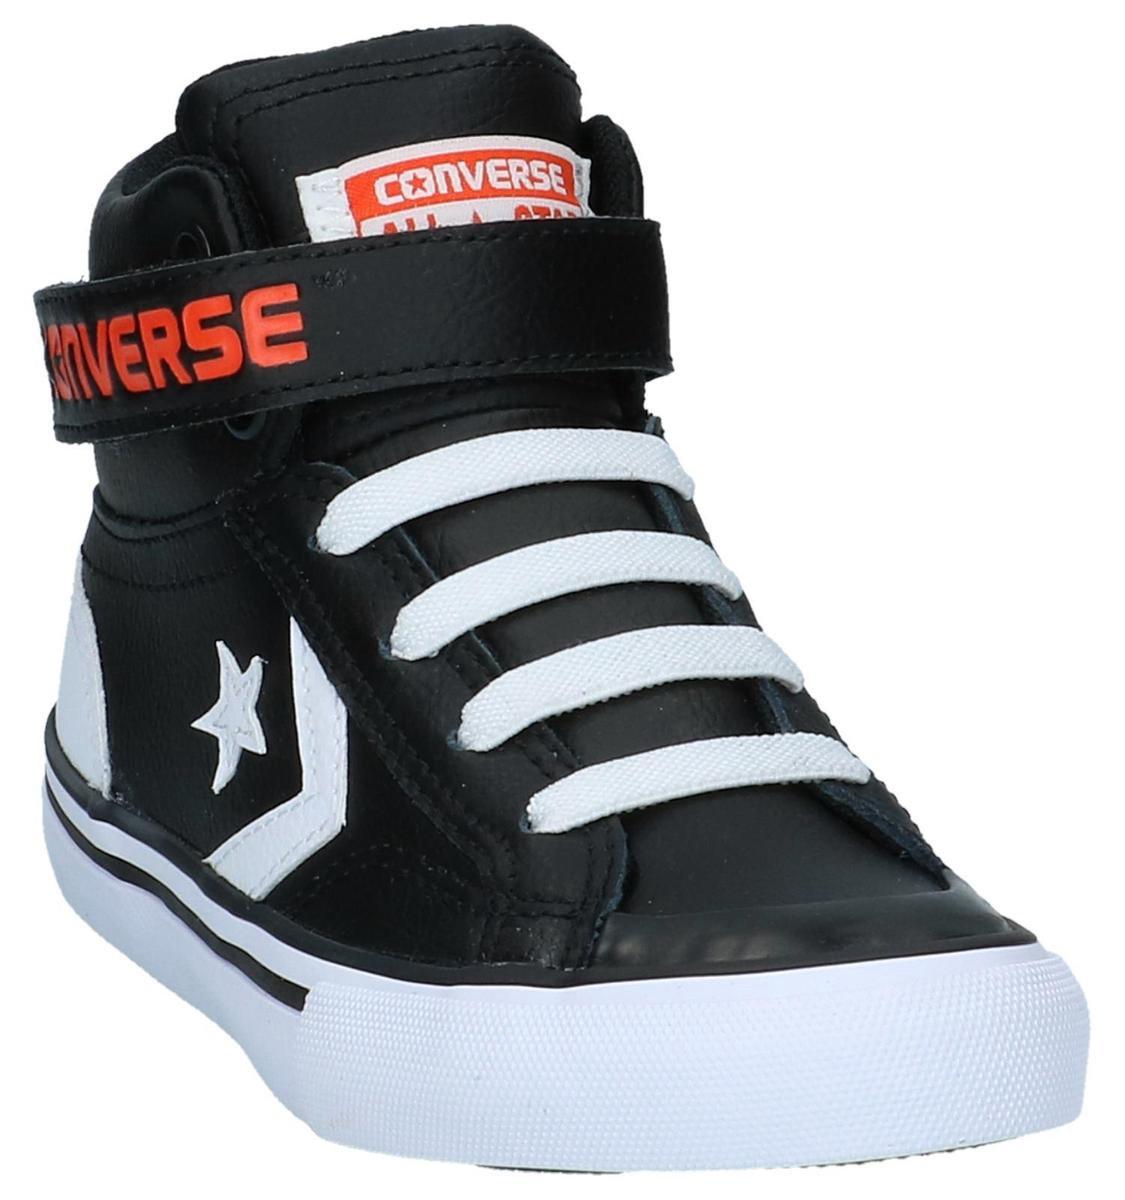   Converse Pro Blaze Strap Hi Skate hoog